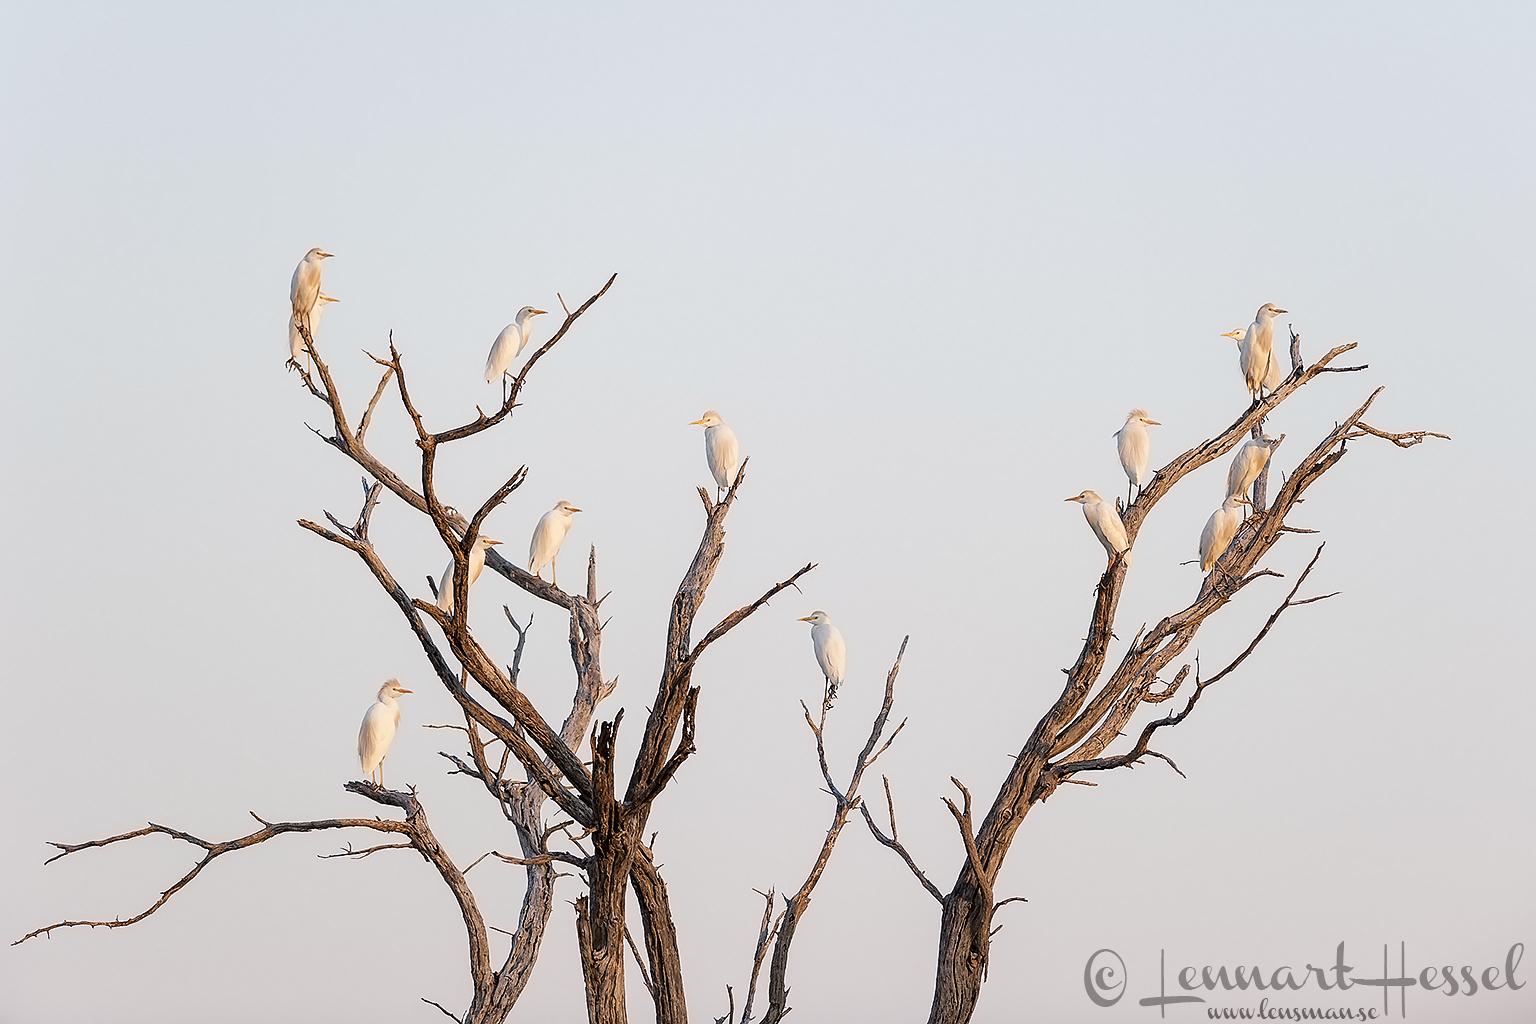 Cattle Egrets in Khwai Community Area, Botswana